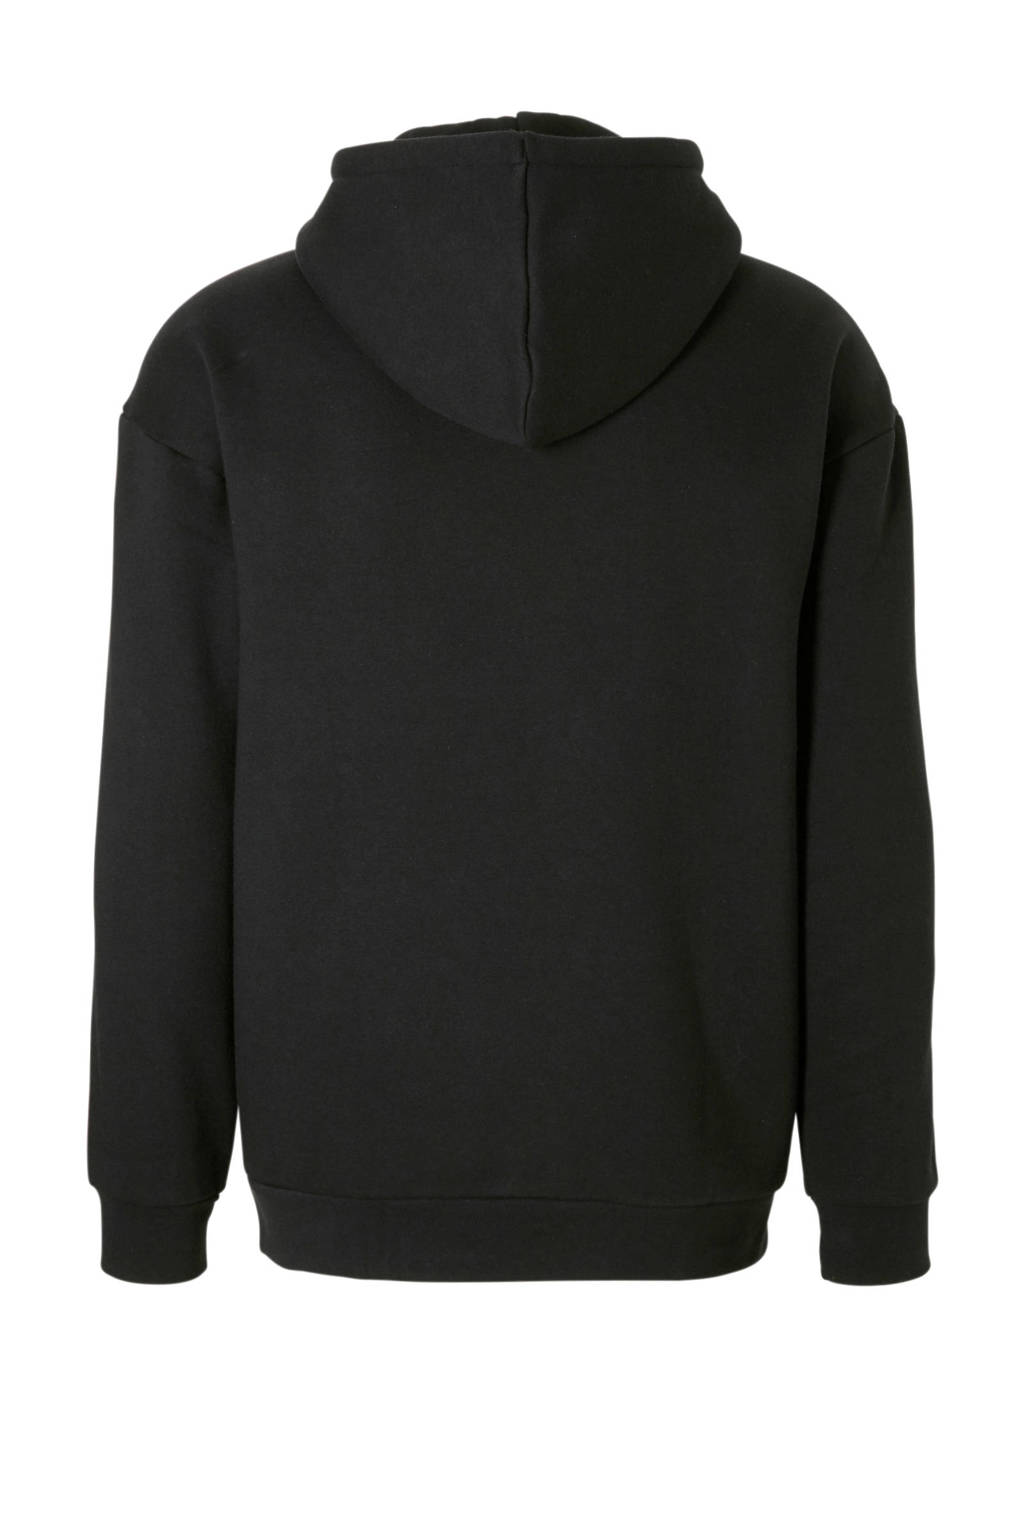 adidas originals   sweater zwart, Zwart/paars/roze